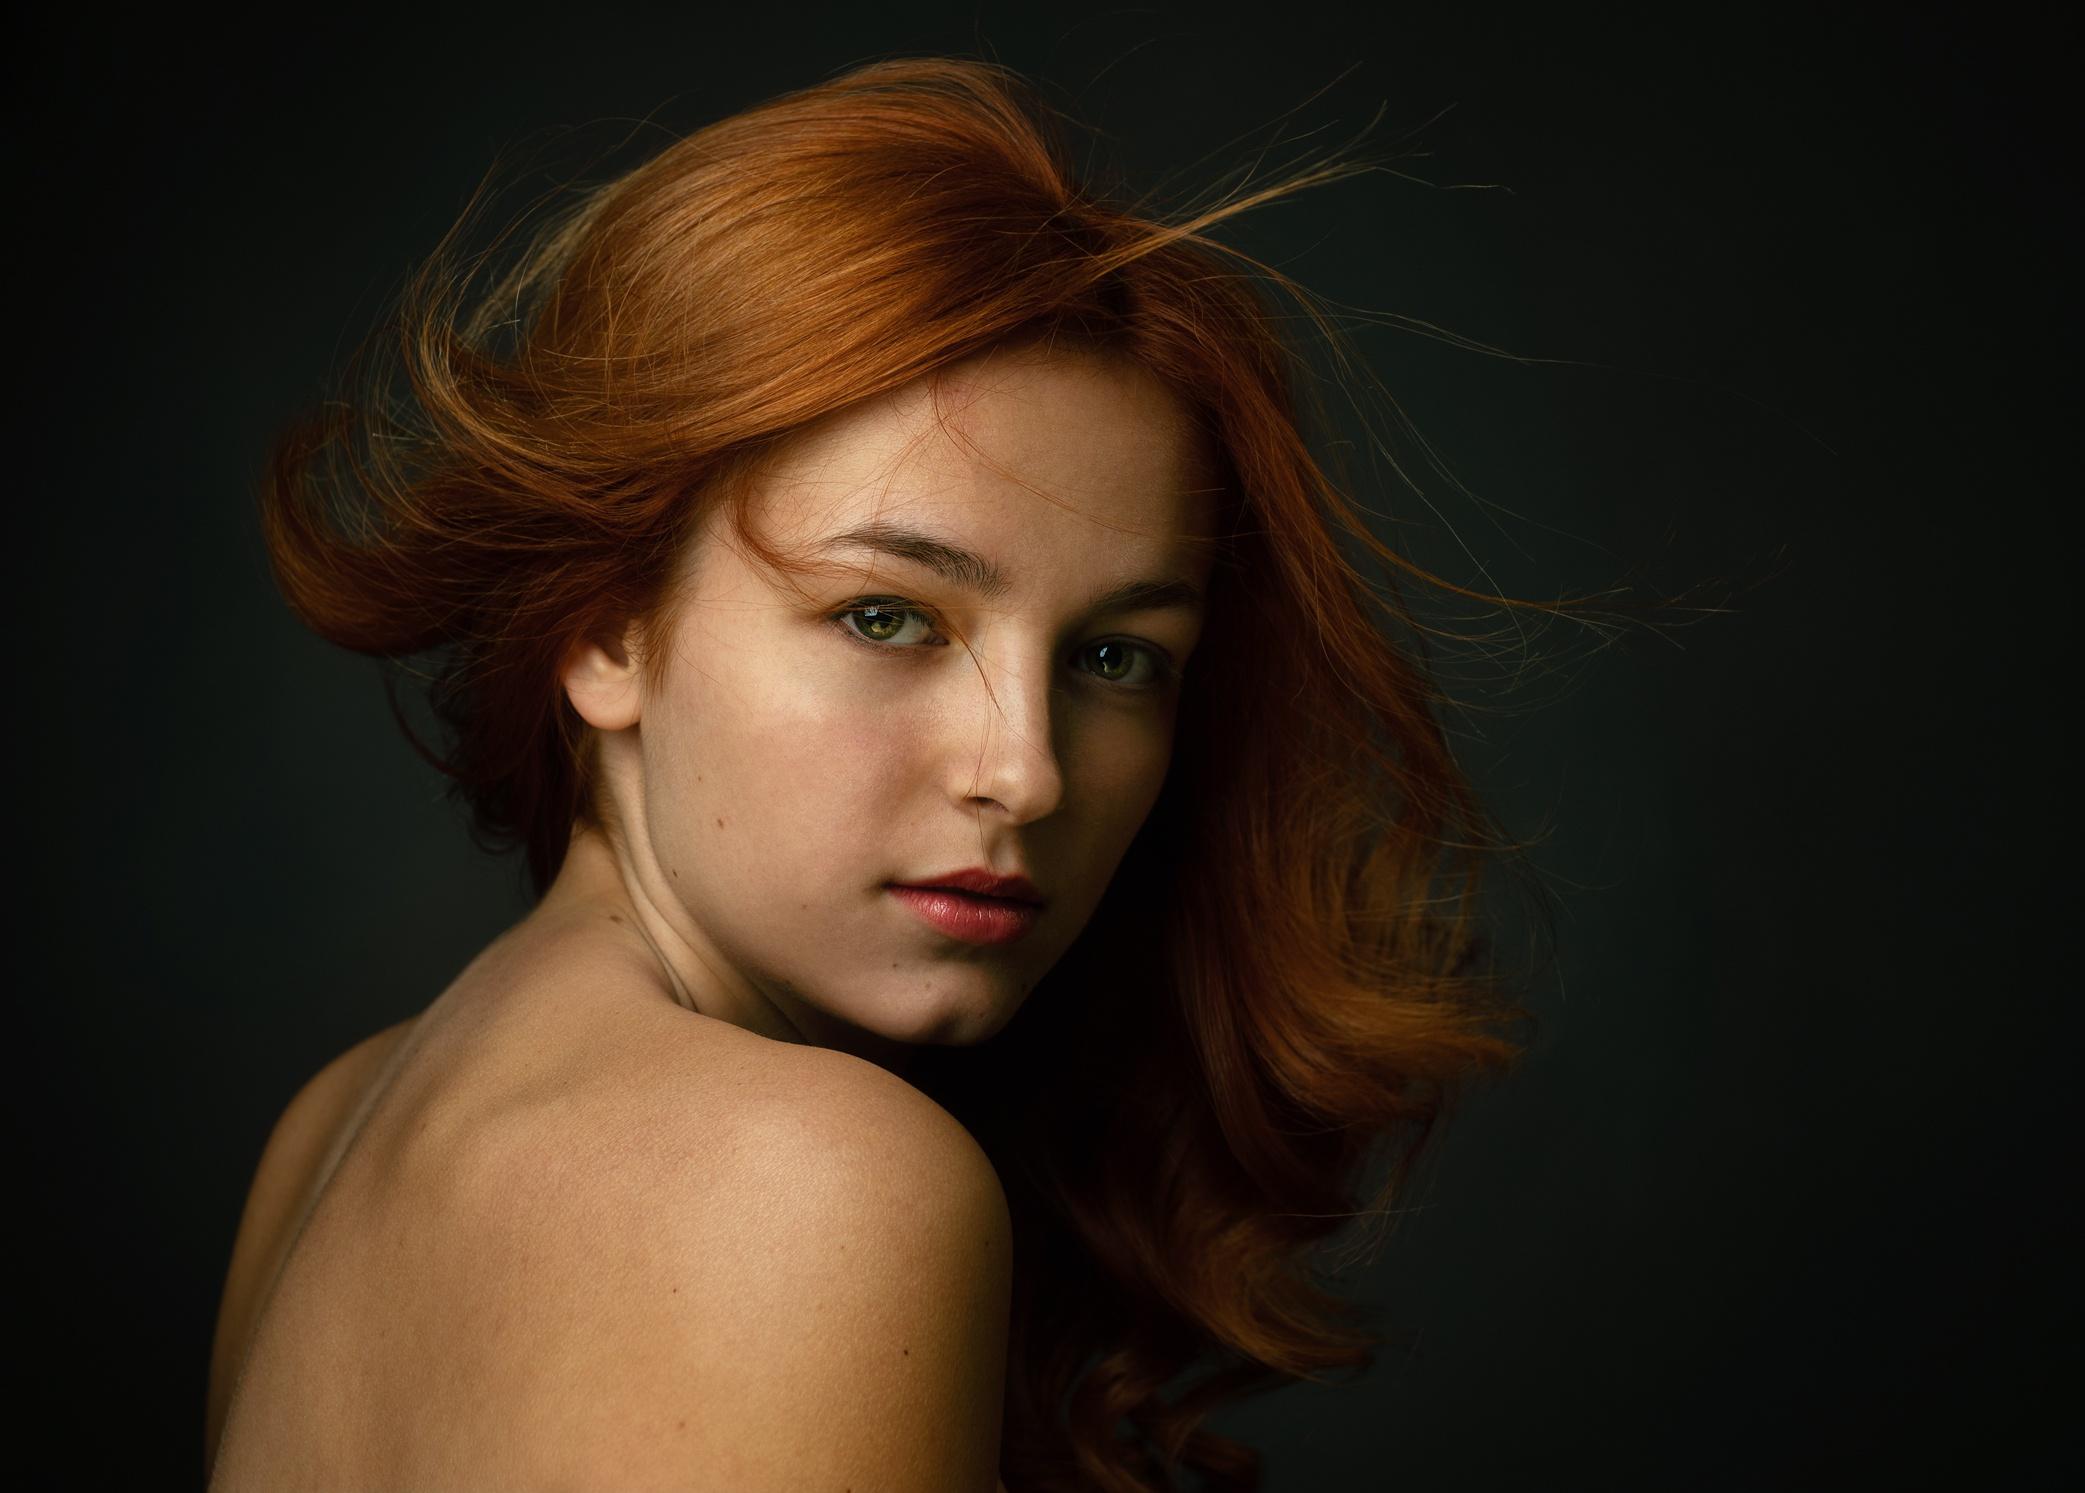 People 2085x1493 bare shoulders redhead portrait face simple background women model Zachar Rise